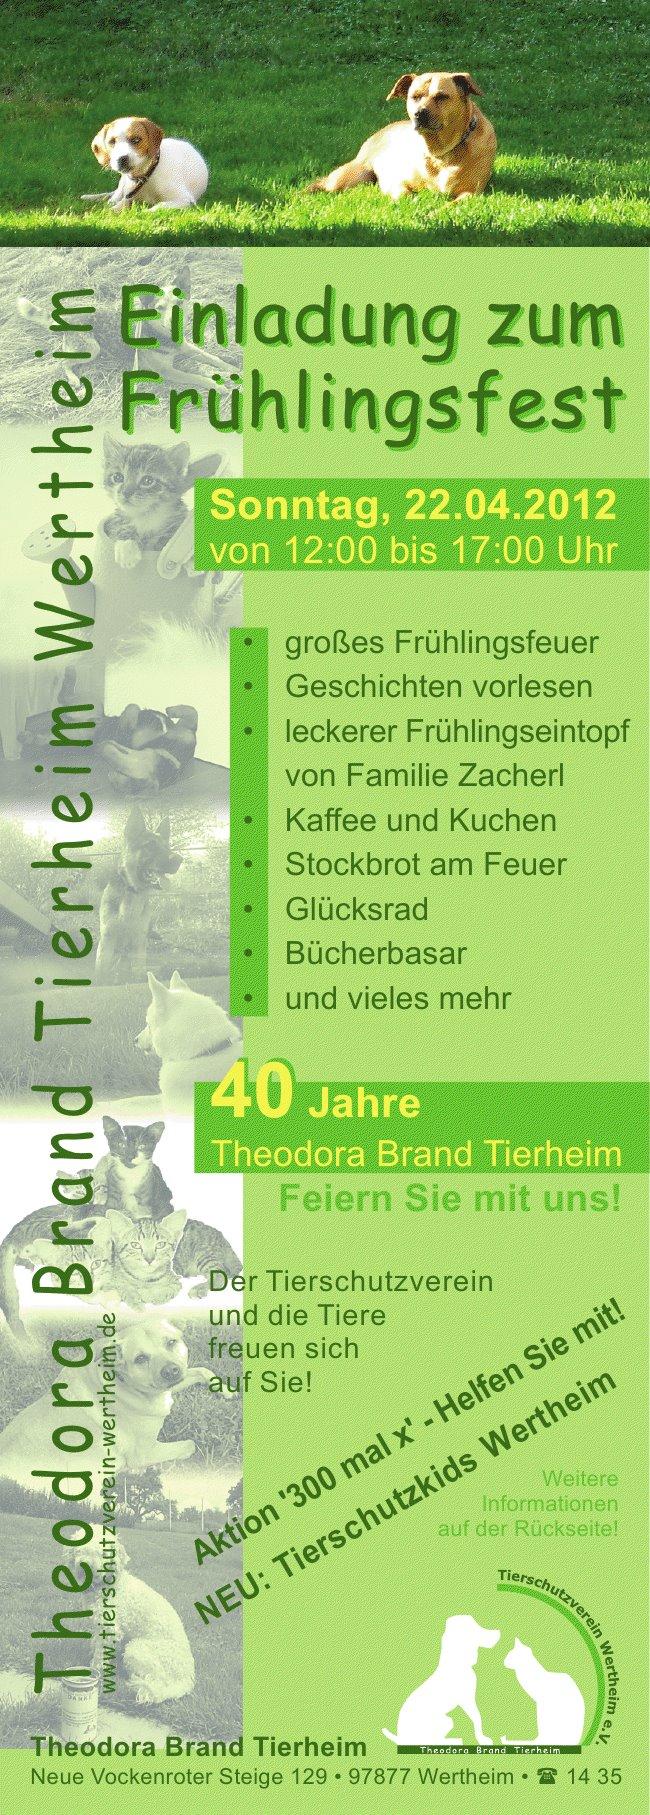 Frühlingsfest am 22. April 2012